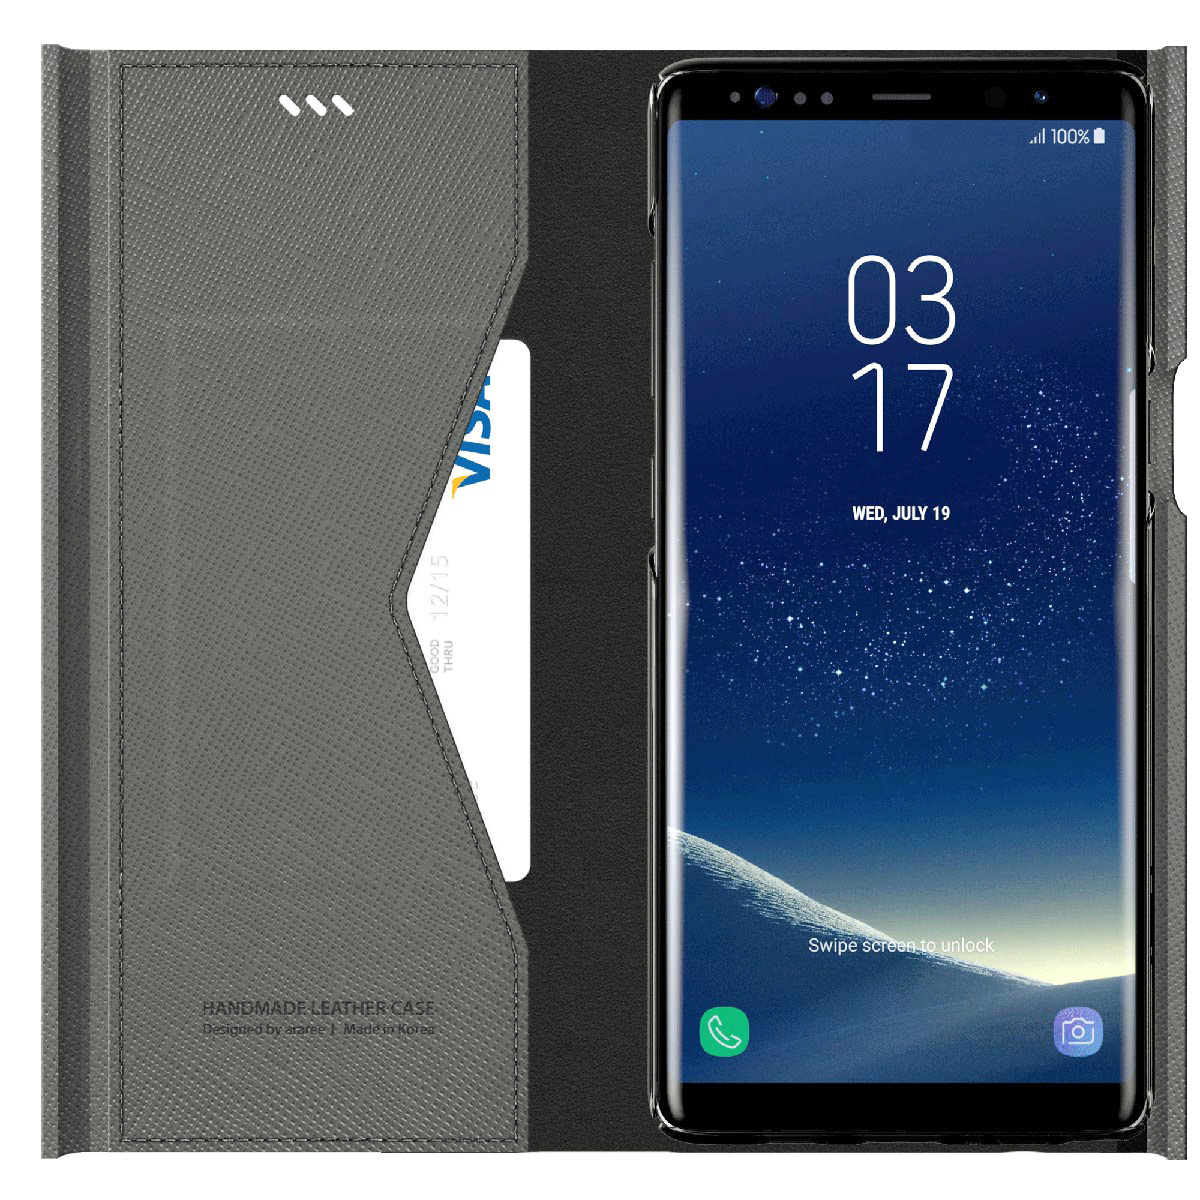 Galaxy Note9 ケース Galaxy Note8 ケース 手帳型 araree BONNET STAND(アラリー ボンネット スタンド)ギャラクシー ノート カバー マグネットクロージング スタンド機能付き SC-01L SCV40 SC-01K SCV37